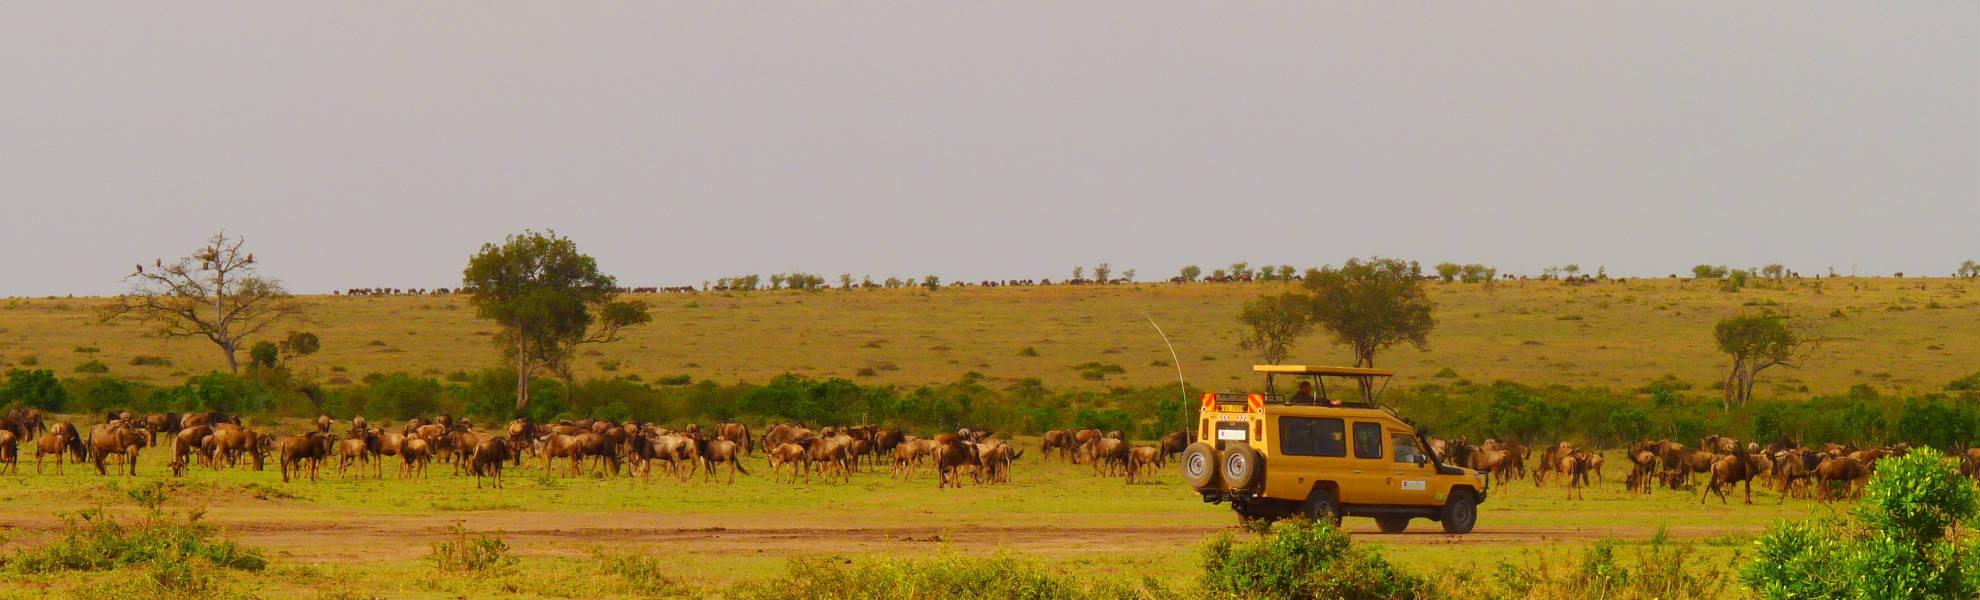 Gnuherde im Mara Schutzgebiet